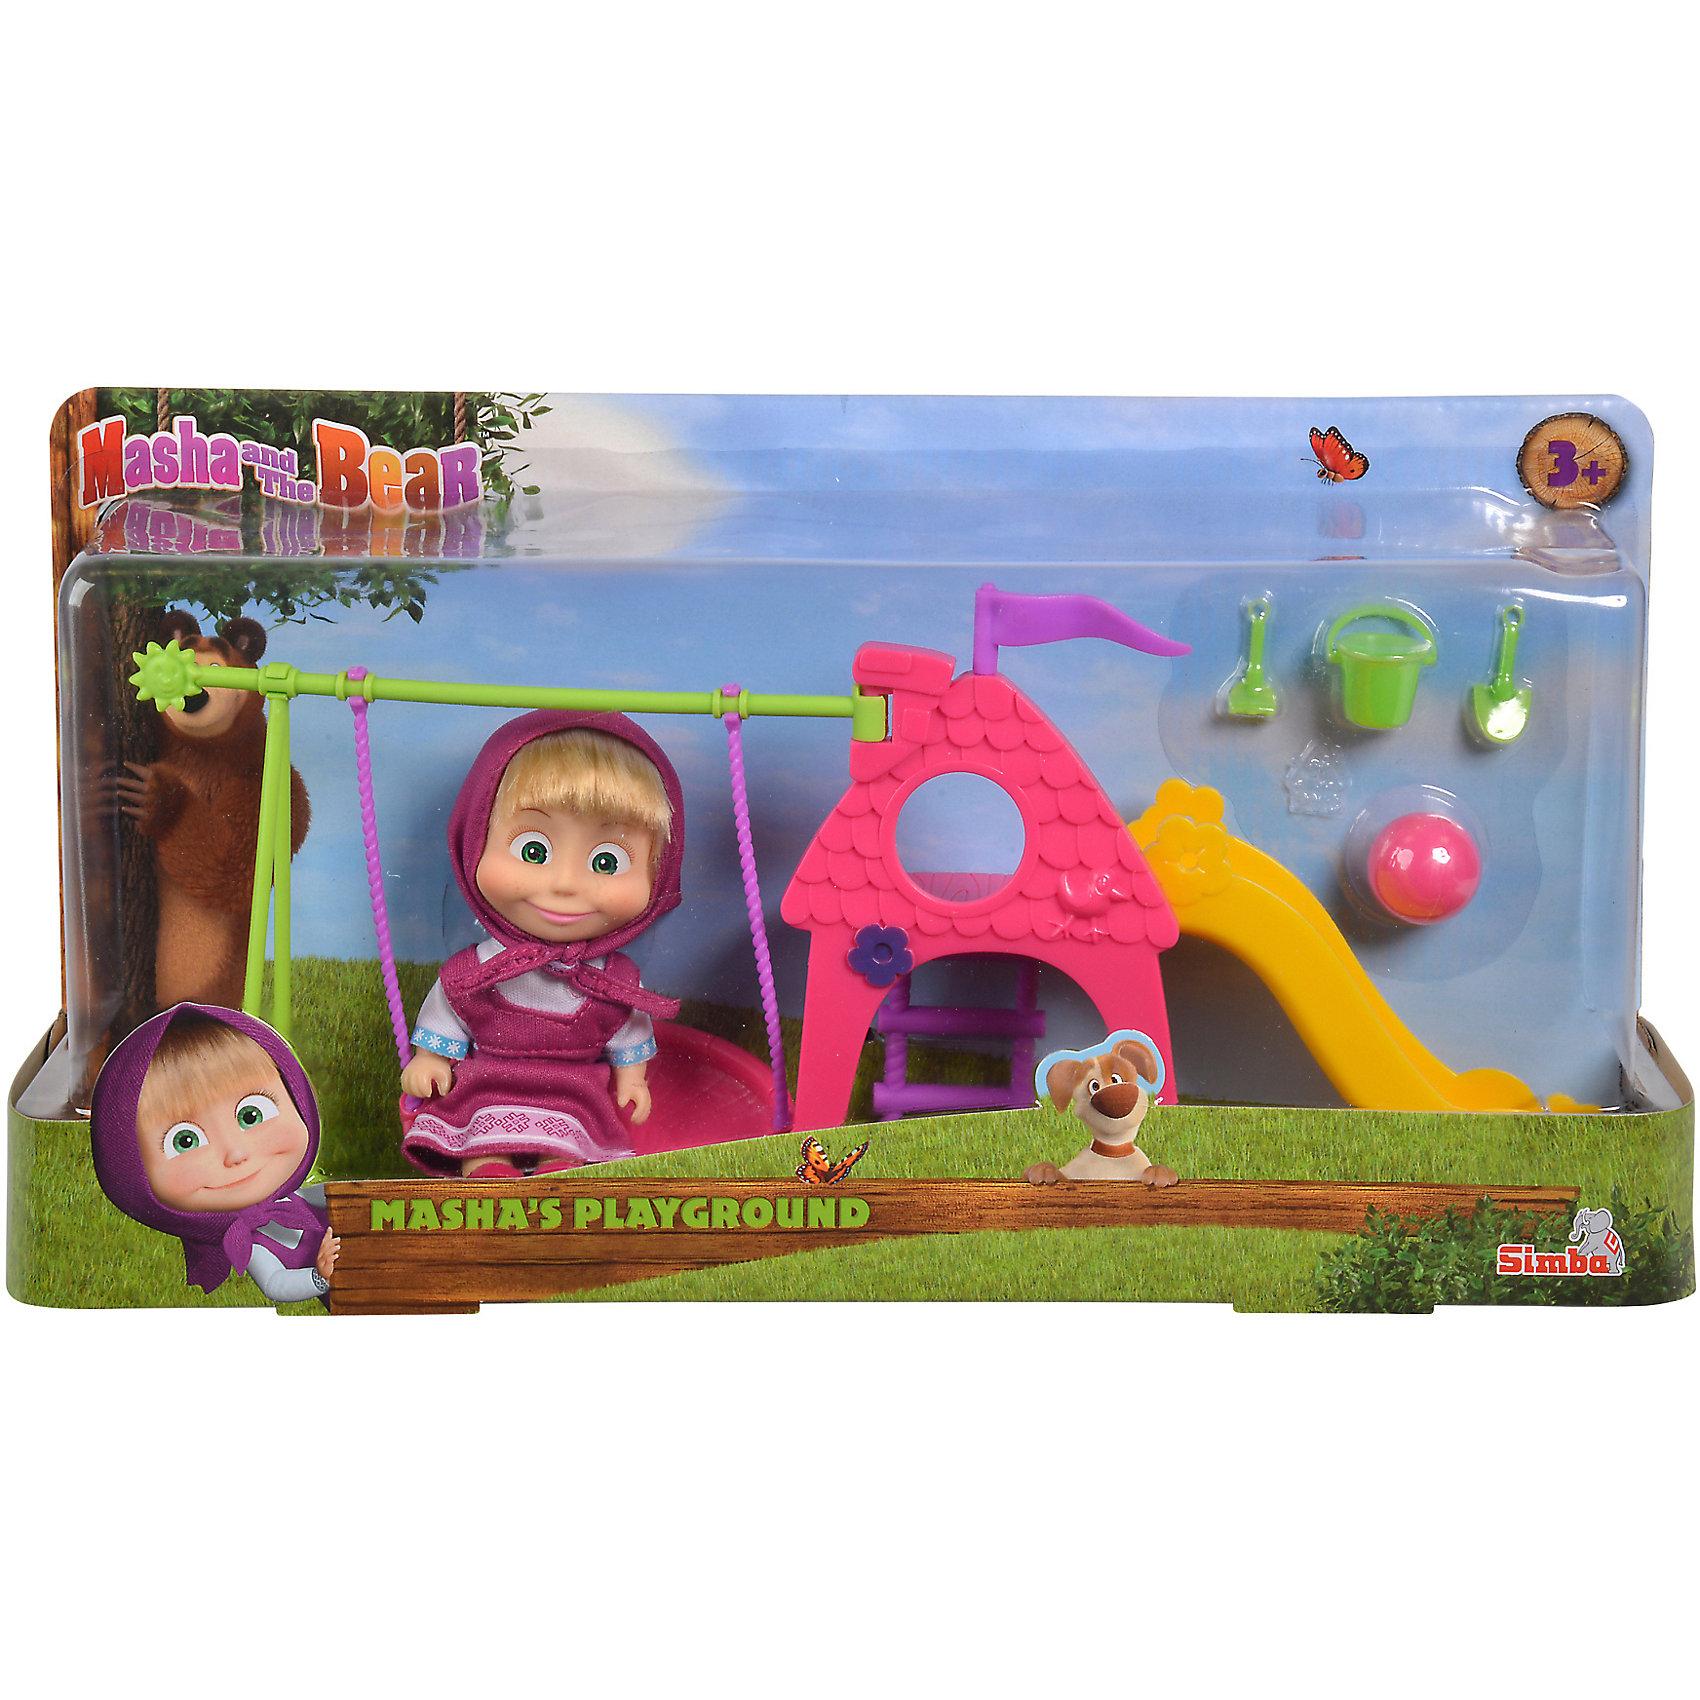 Кукла Маша с площадкой, Маша и Медведь, Simba от myToys